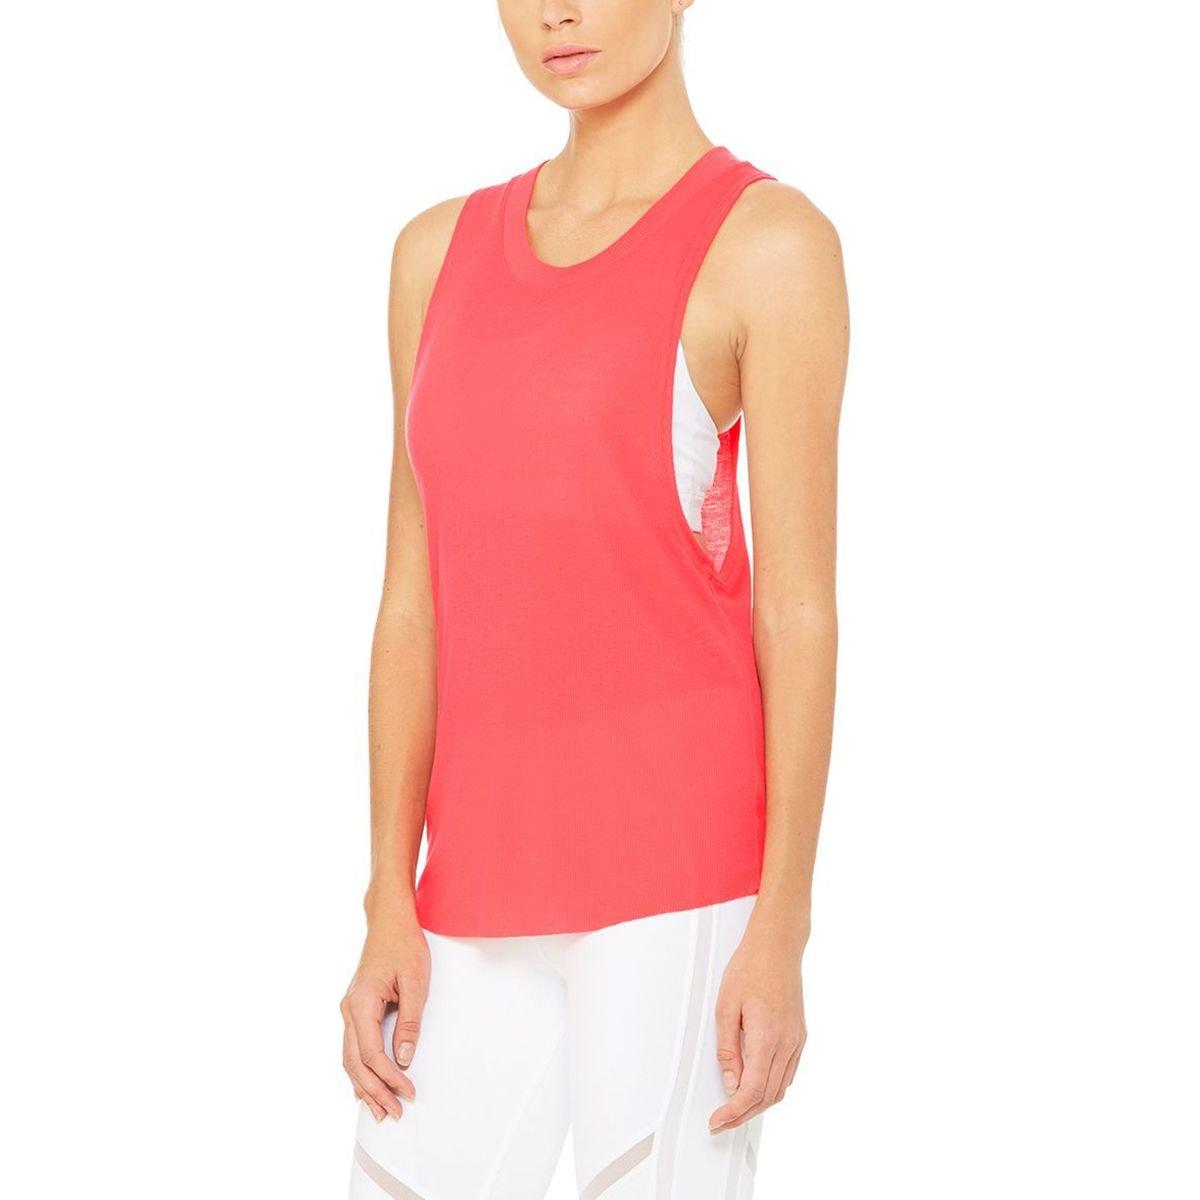 81d747e1d505b ALO Women s Heat-Wave Tank Top Rich Peony Tank Top at Amazon Women s  Clothing store